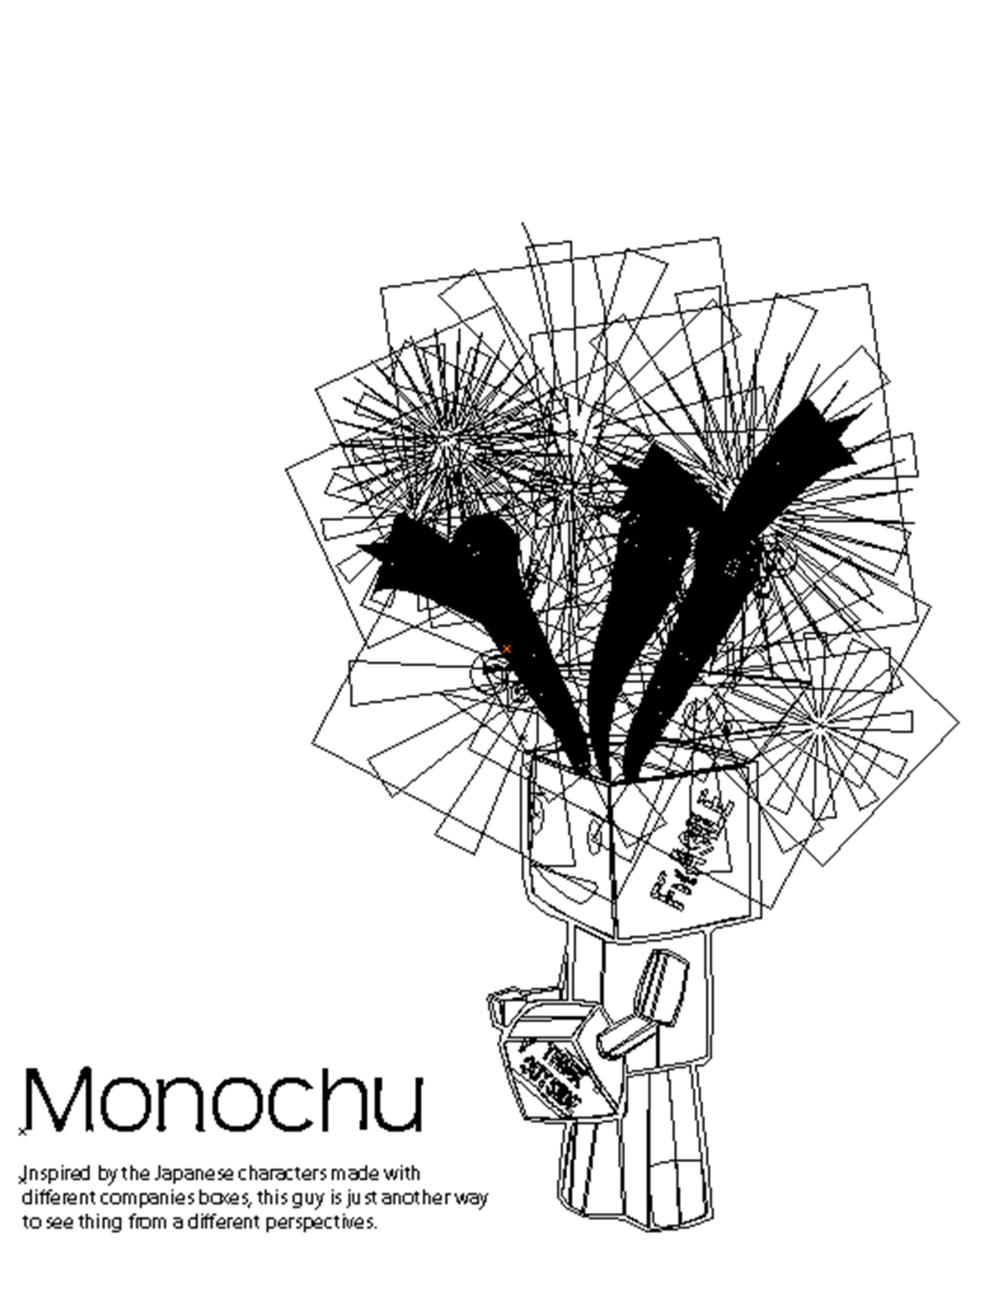 Monochu_wire2.png